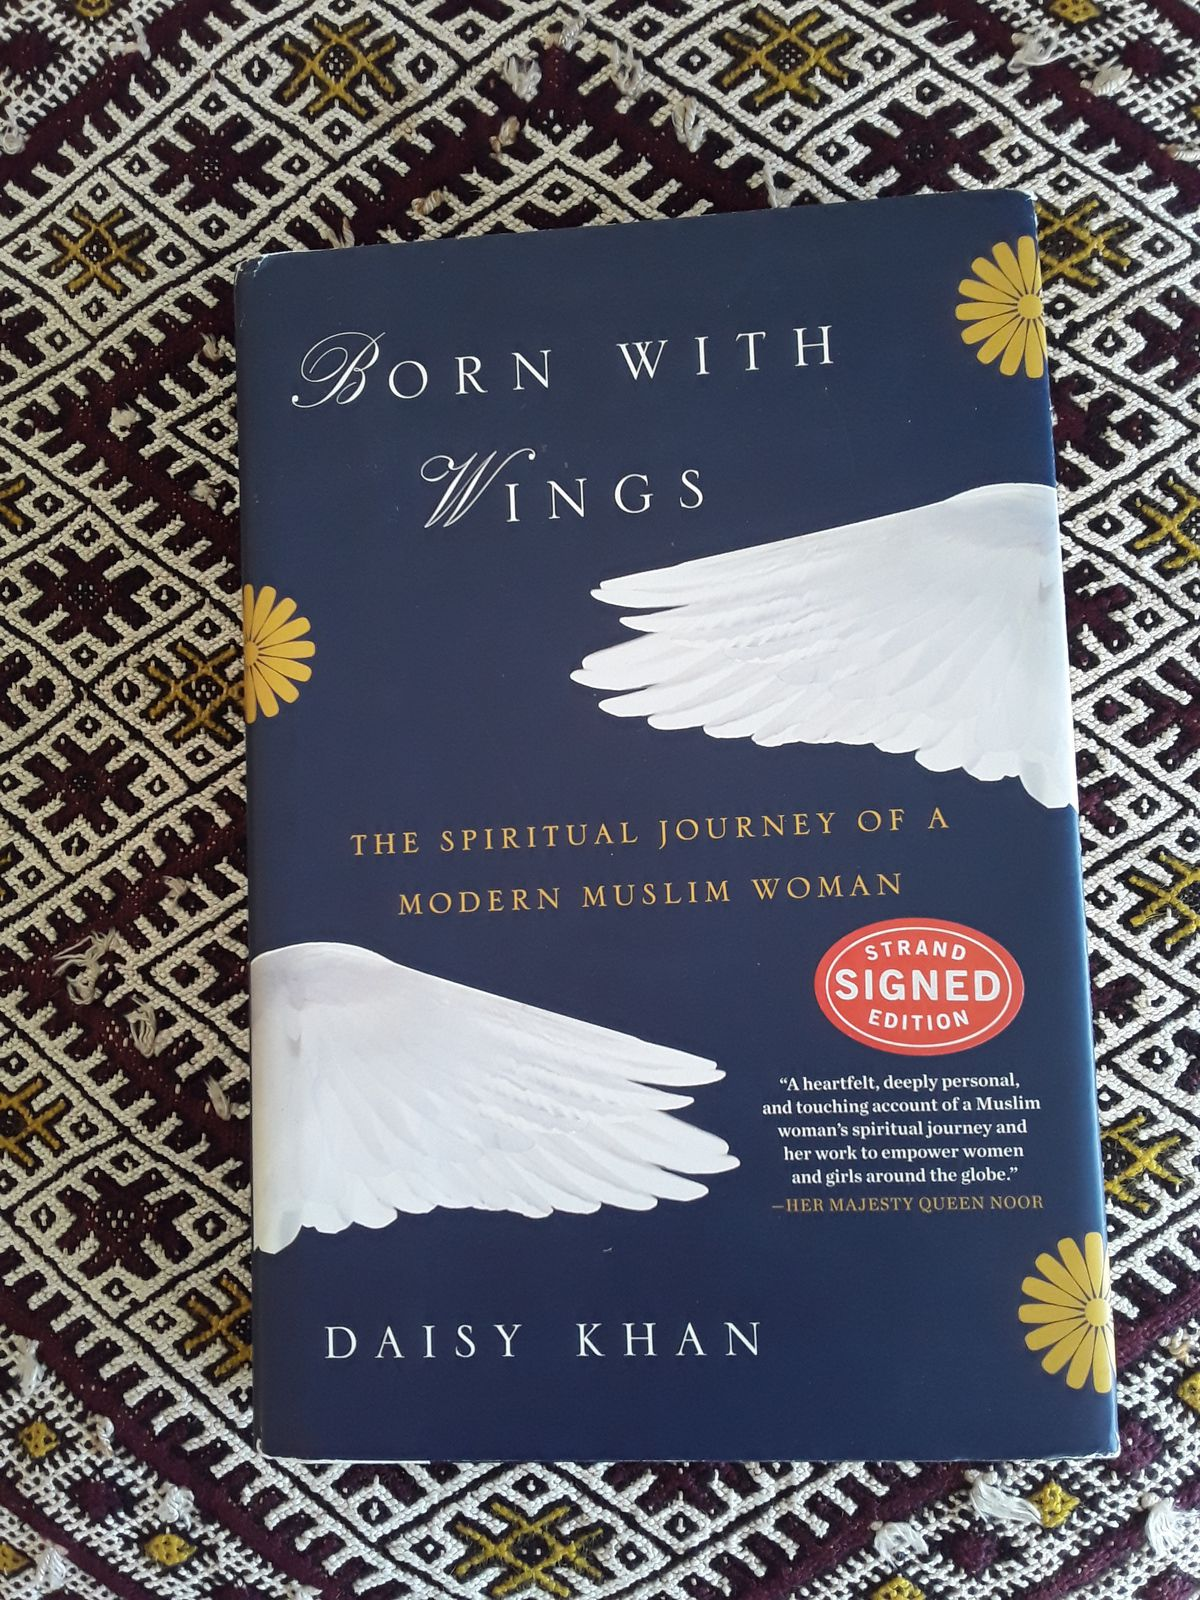 Daisy Khan fascinating auto biography